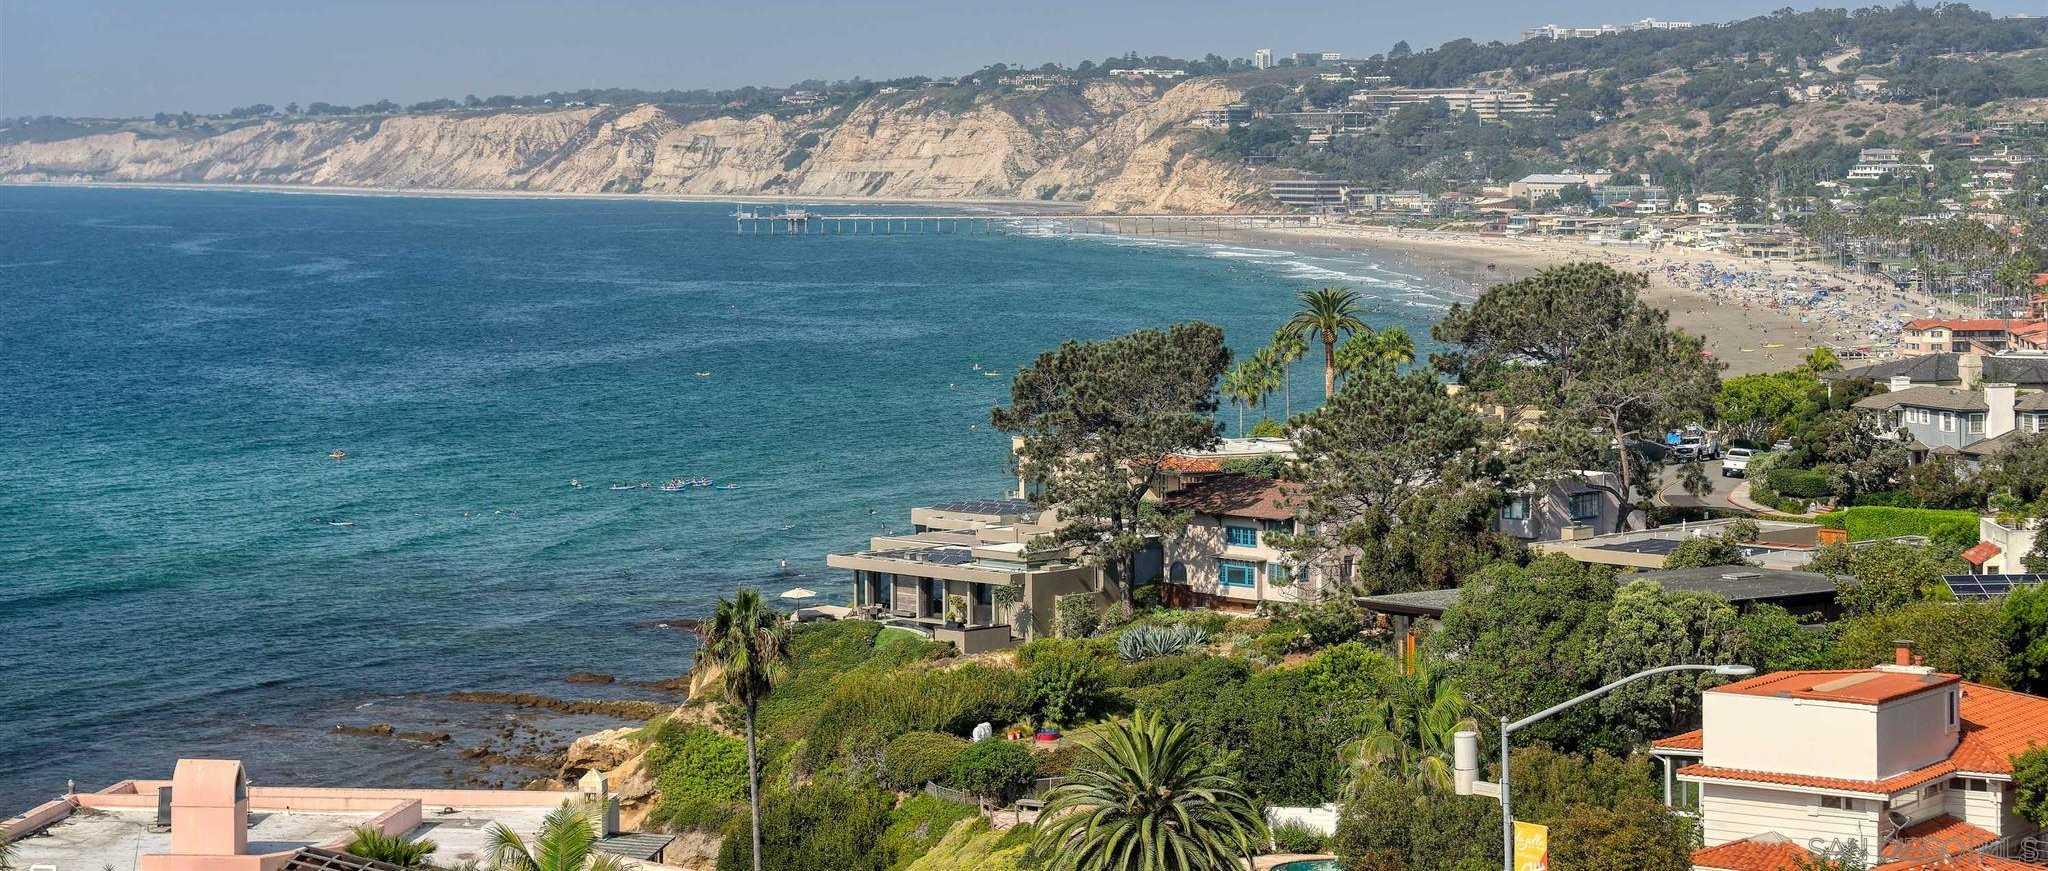 $3,995,000 - 3Br/5Ba -  for Sale in Country Club, La Jolla